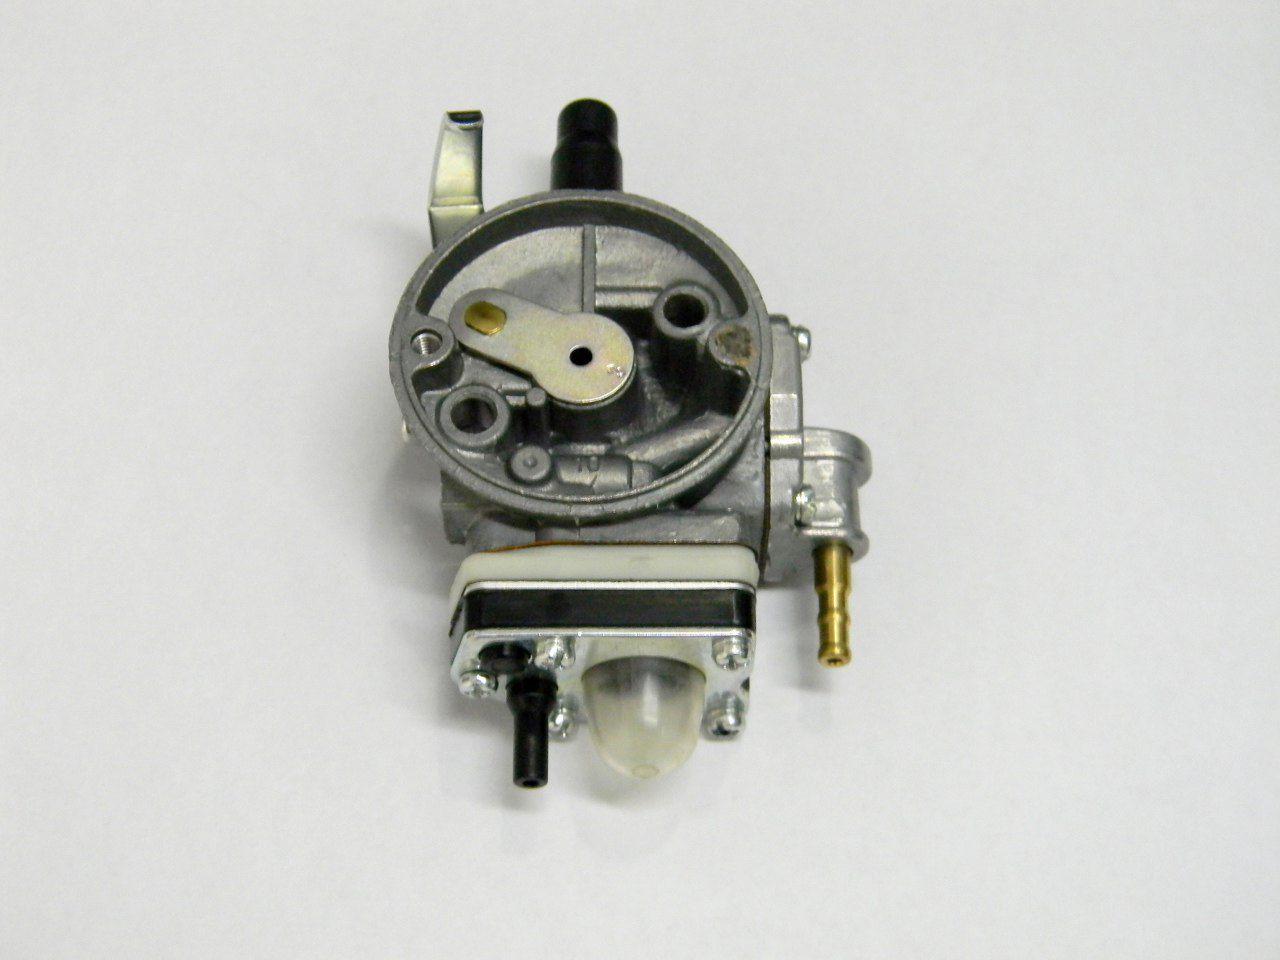 Carburador Roçadeira Shindaiwa B450 - 9800334